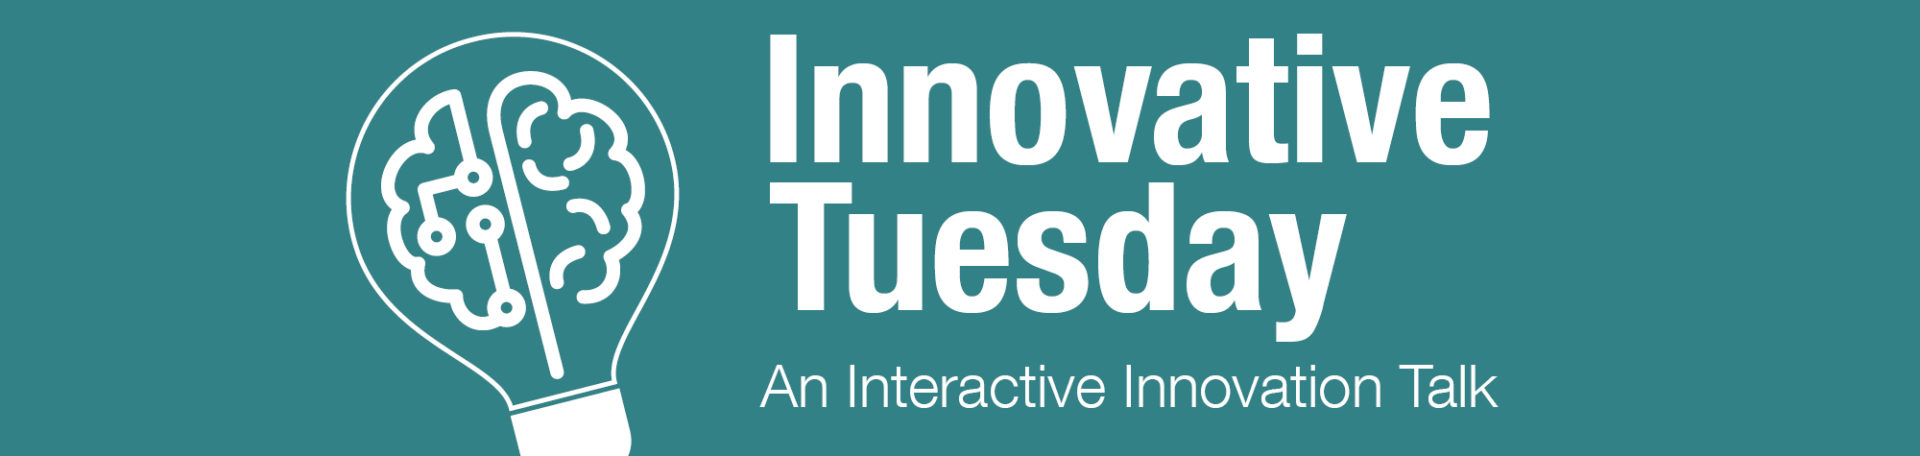 Innovative Tuesday <br> 09 July 2019